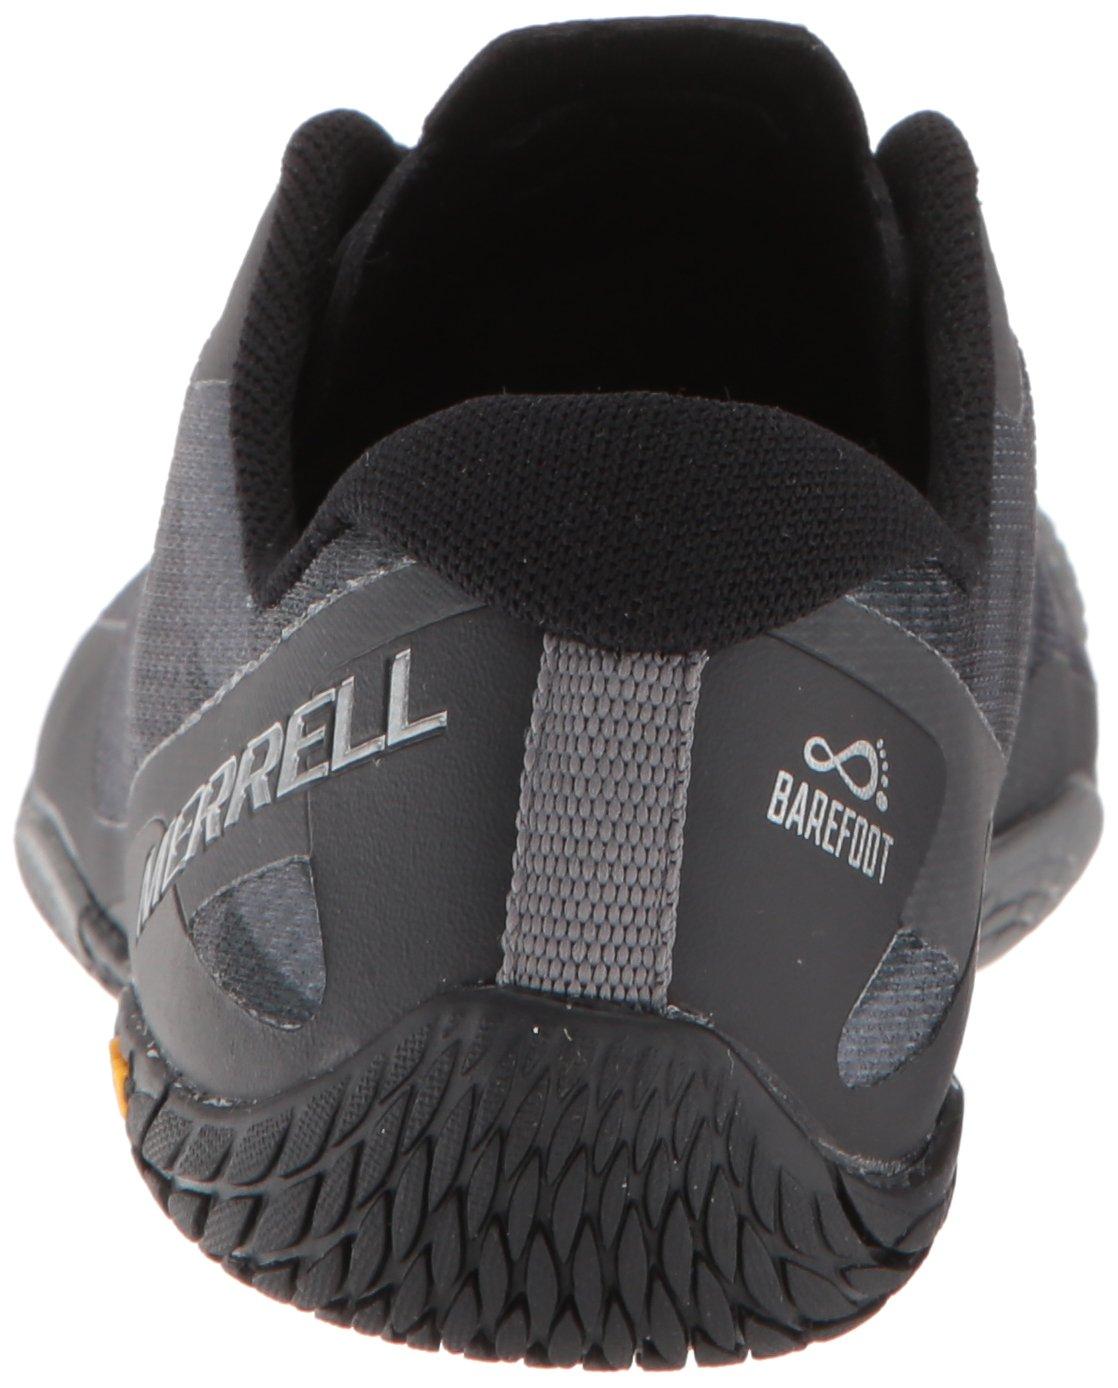 Merrell Women's Vapor Glove 3 Trail Runner B072JXGPW1 6 B(M) US|Black/Silver